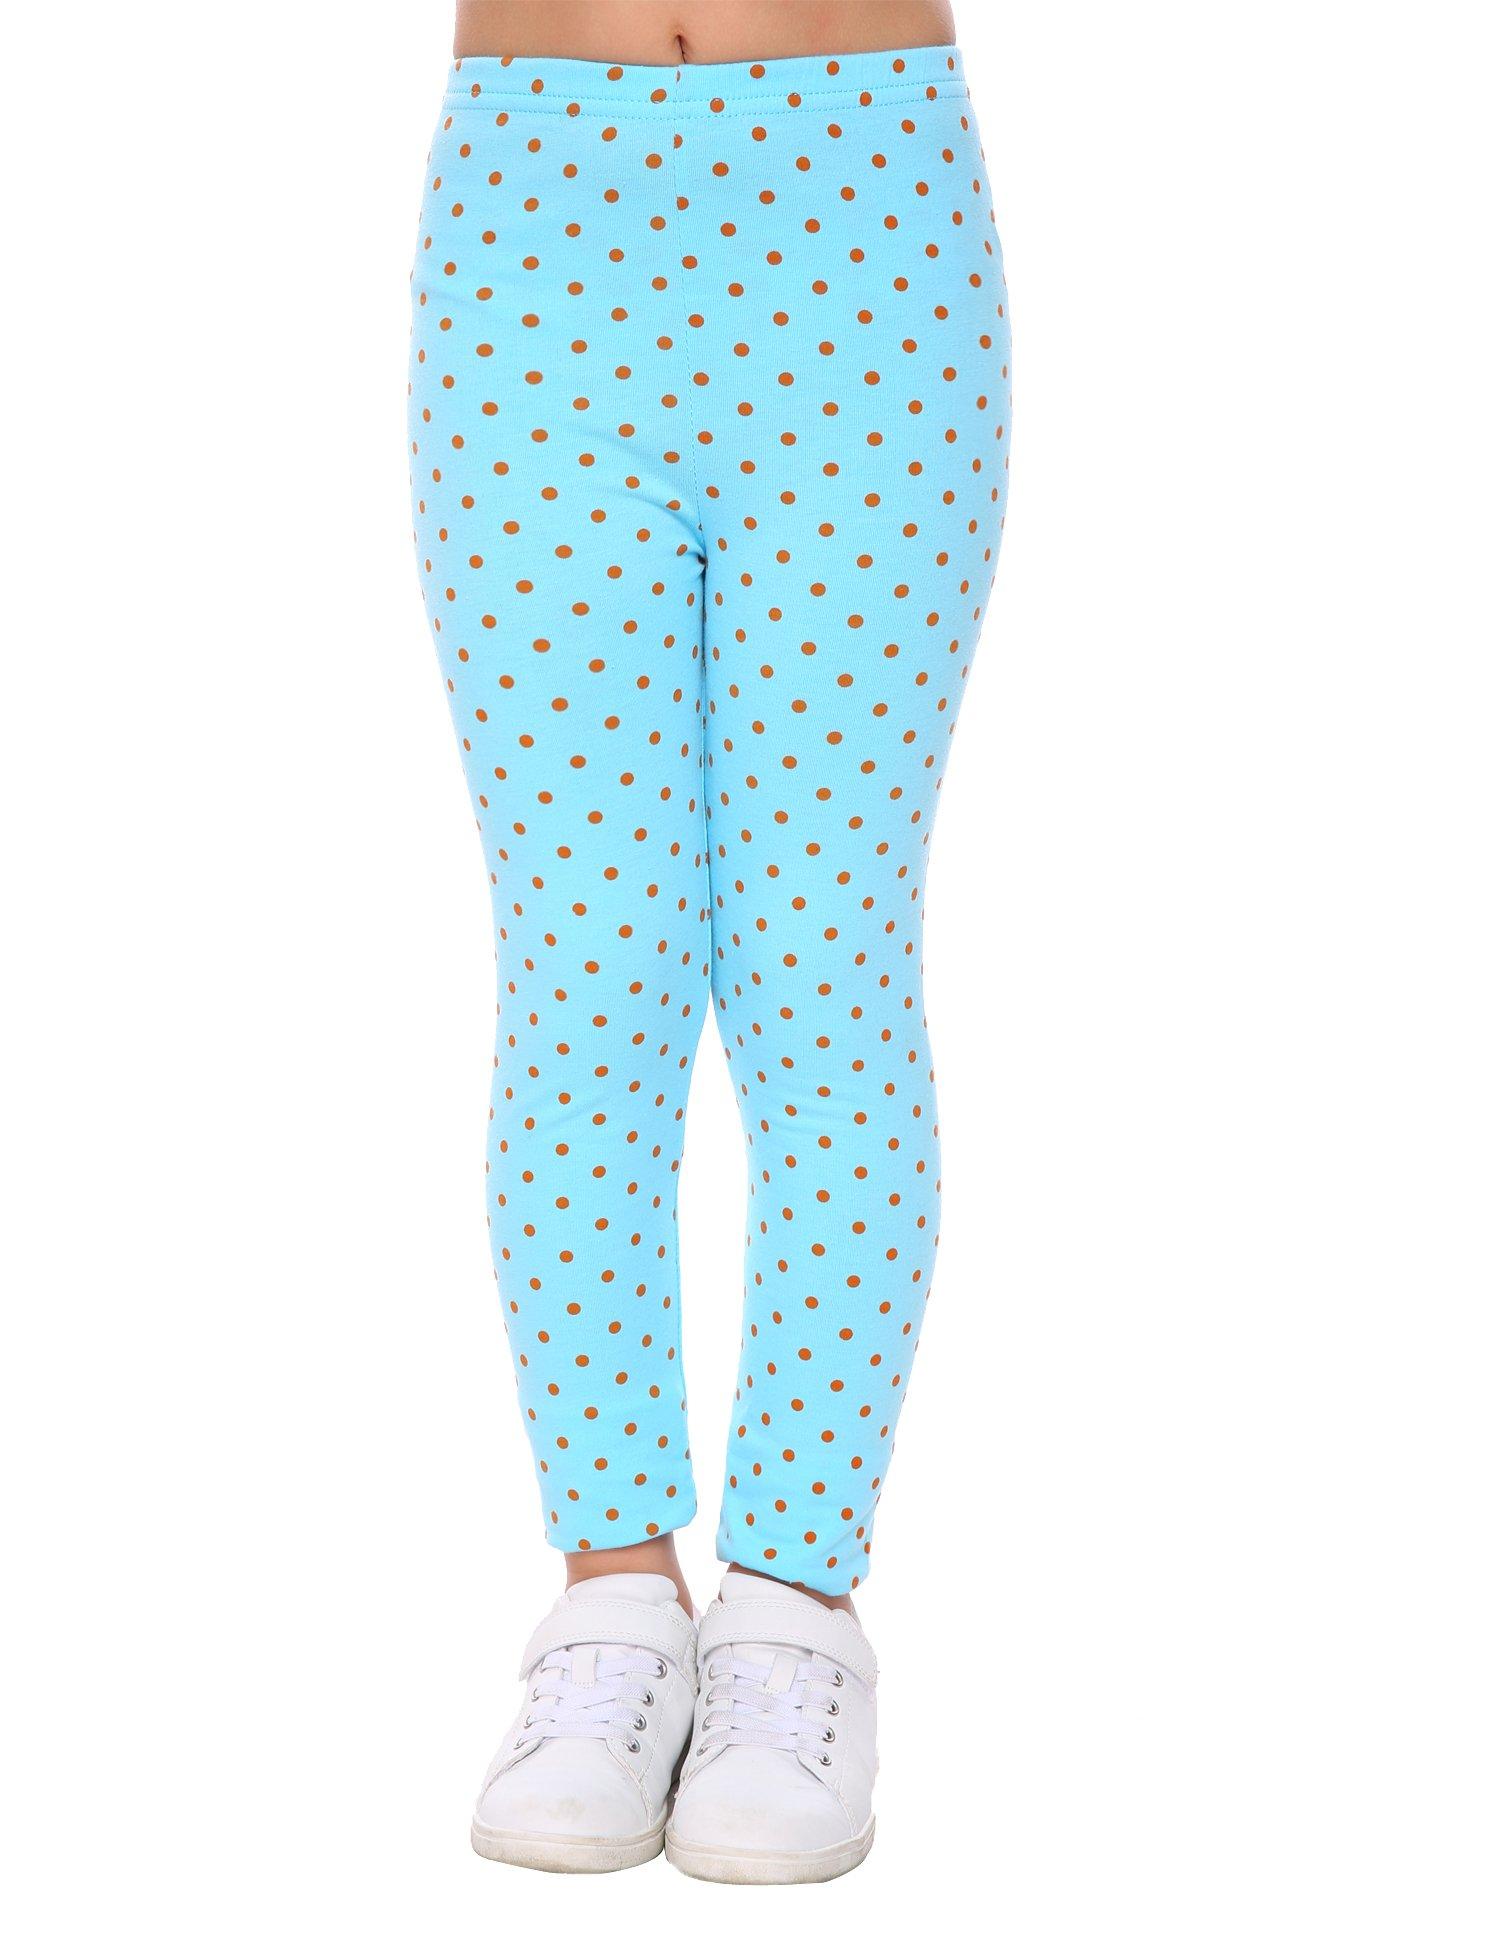 Arshiner Kids Toddle Girls Polka Dot Elastic Waist Cotton Pants Autumn Leggings,Sky Blue,110(4-5years old)